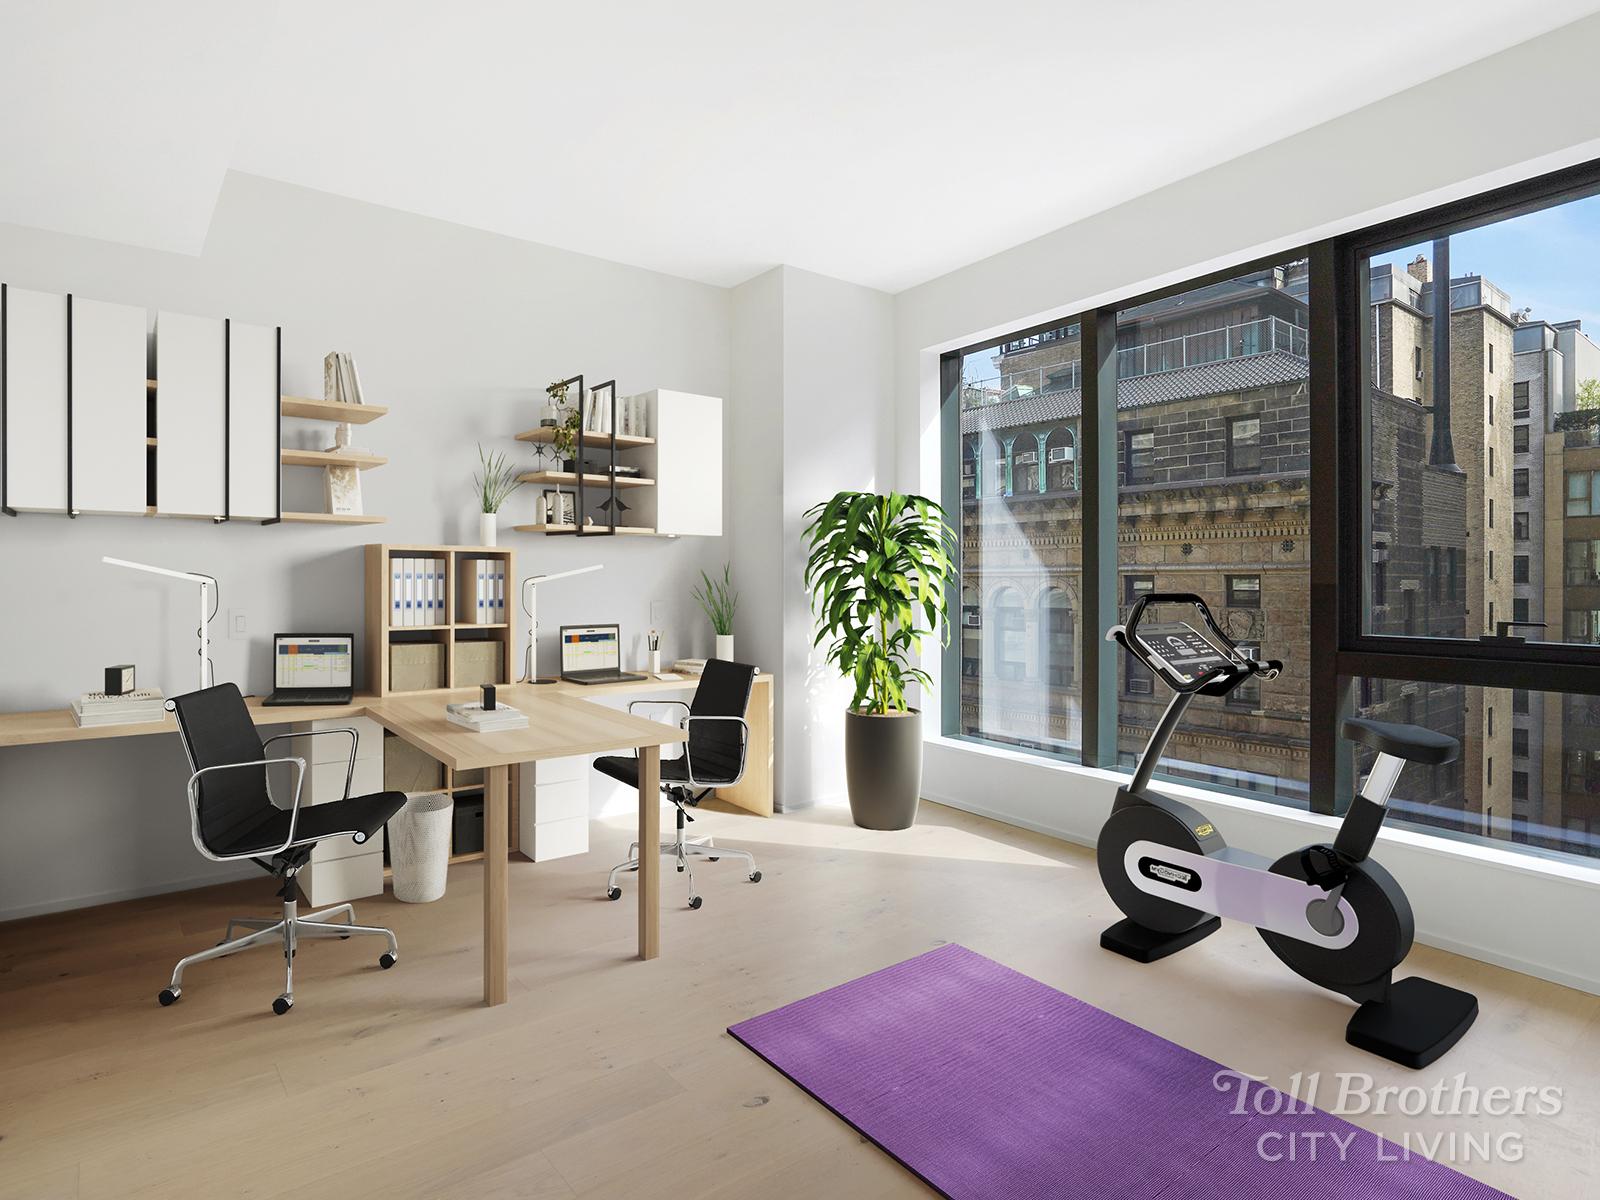 121 East 22nd Street S901 Gramercy Park New York NY 10010